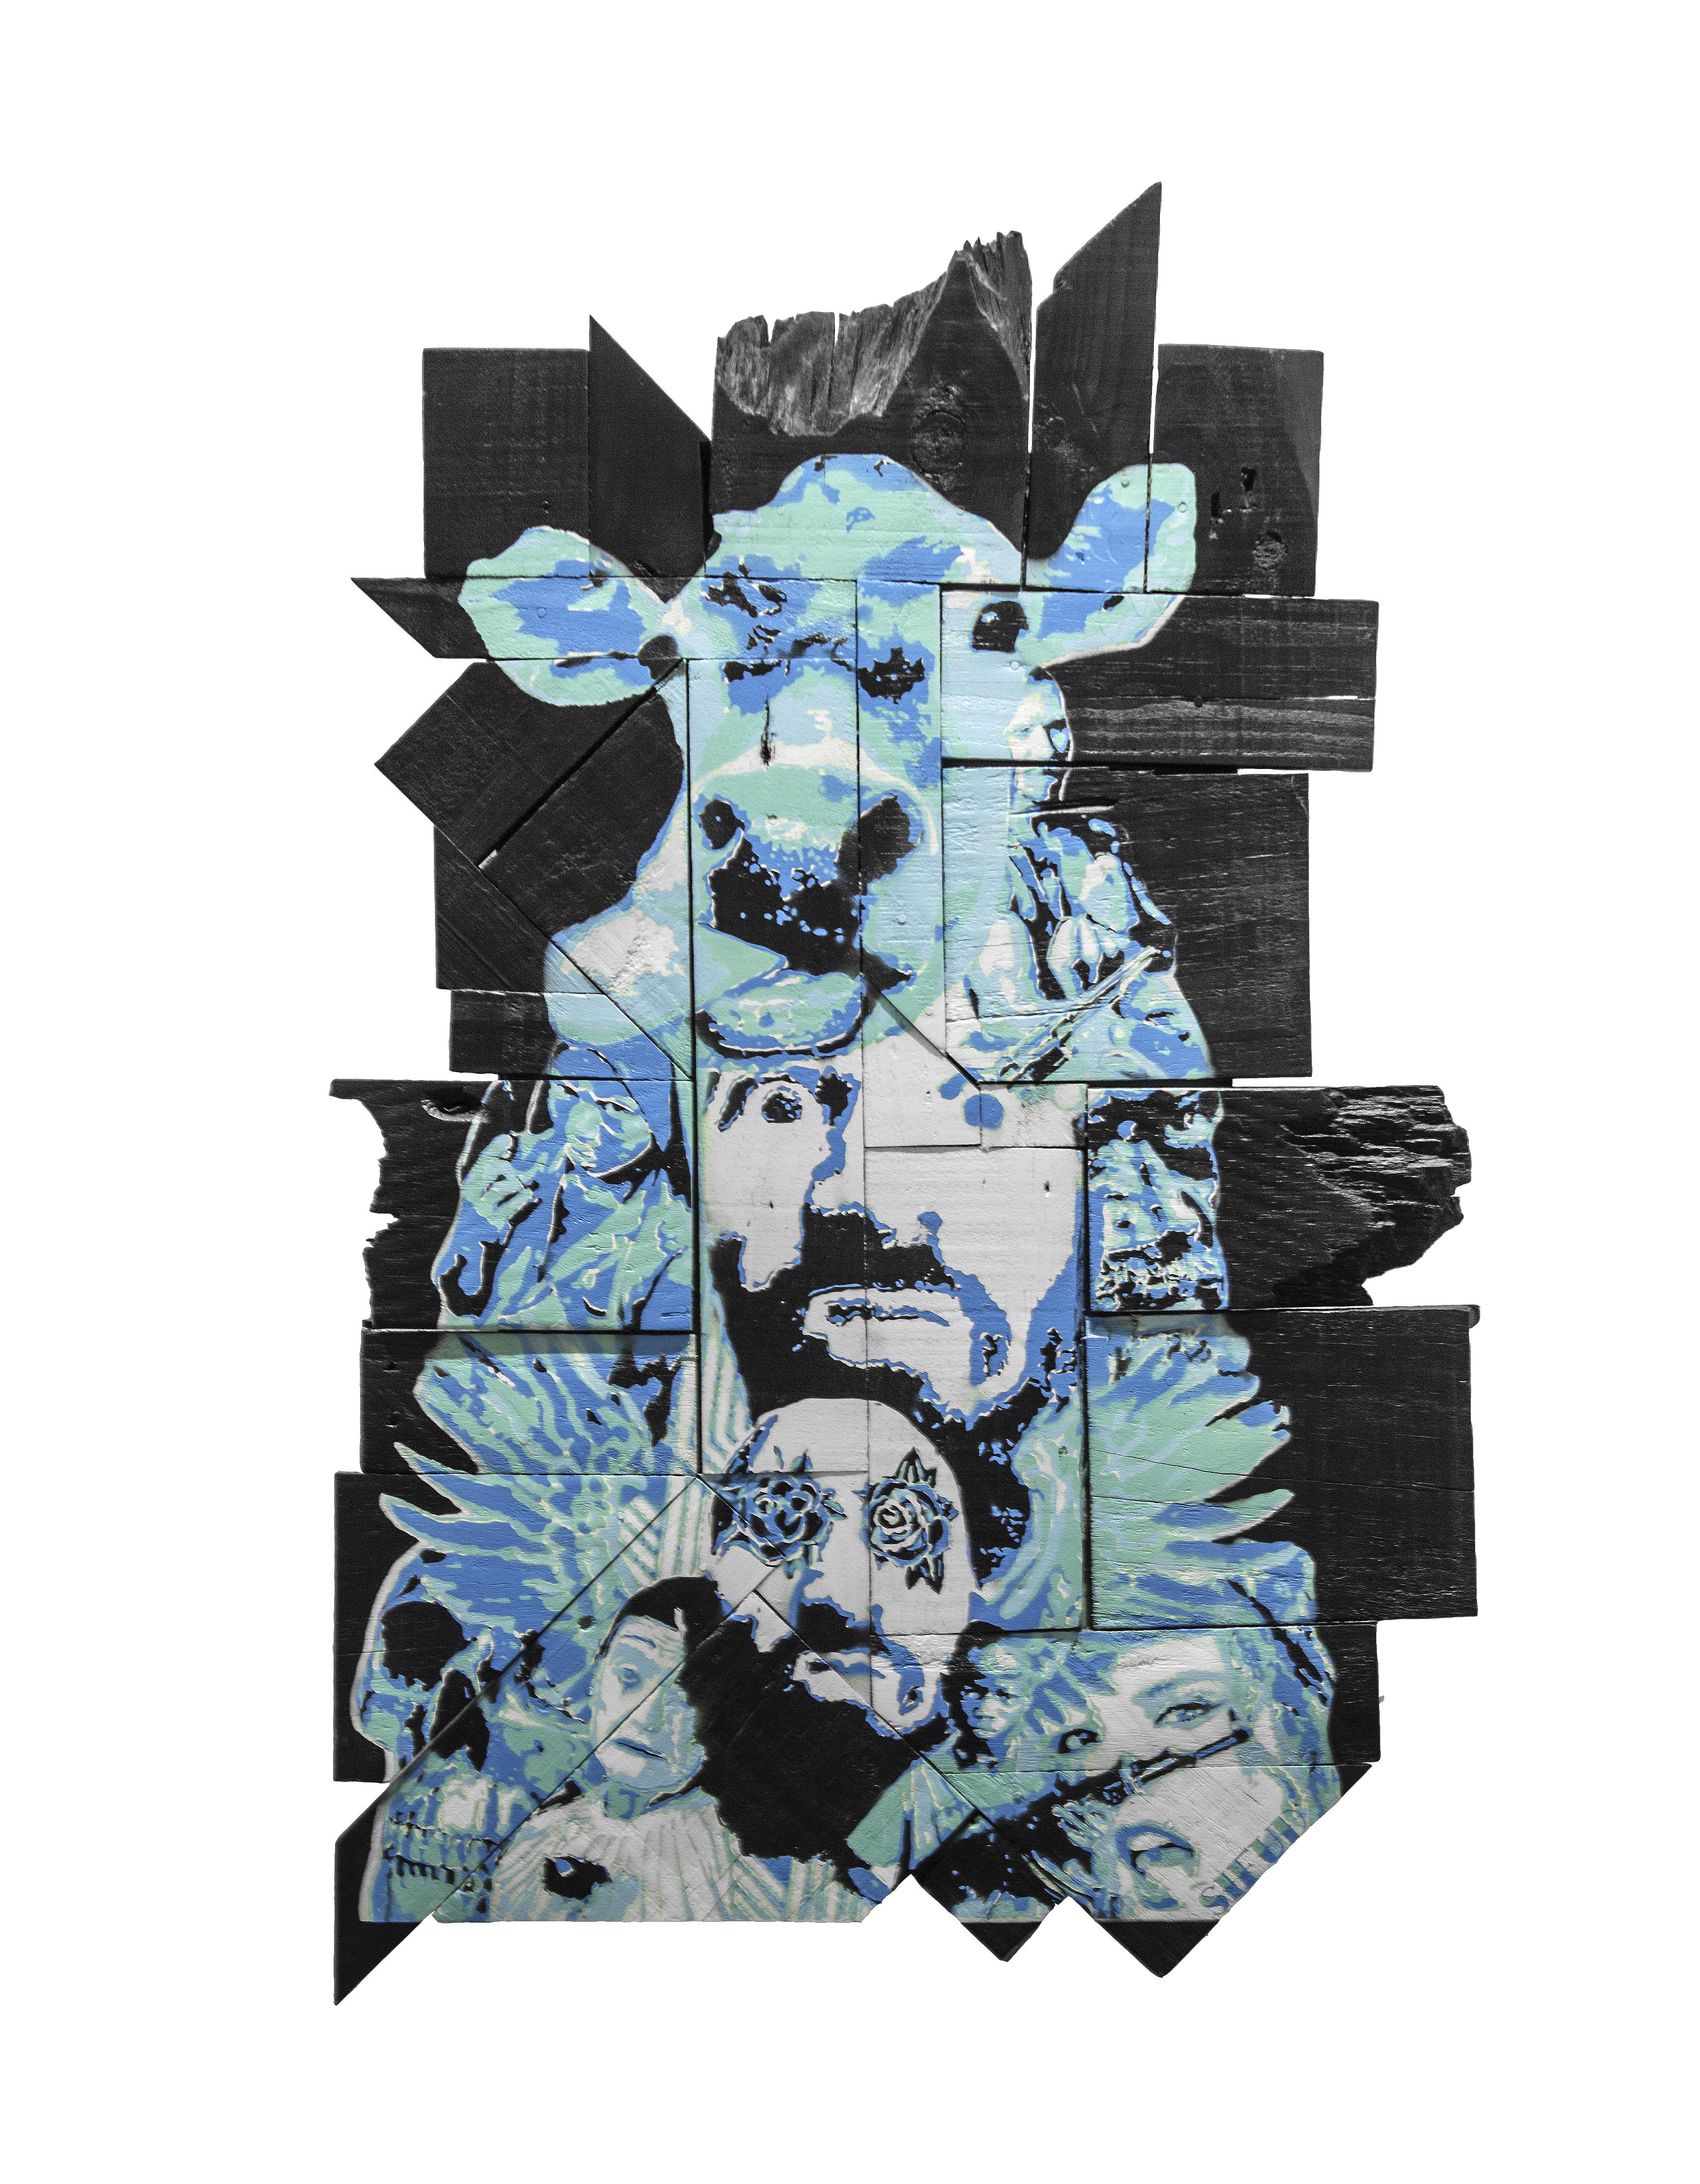 Artist Kleber Cianni stencil work on wood